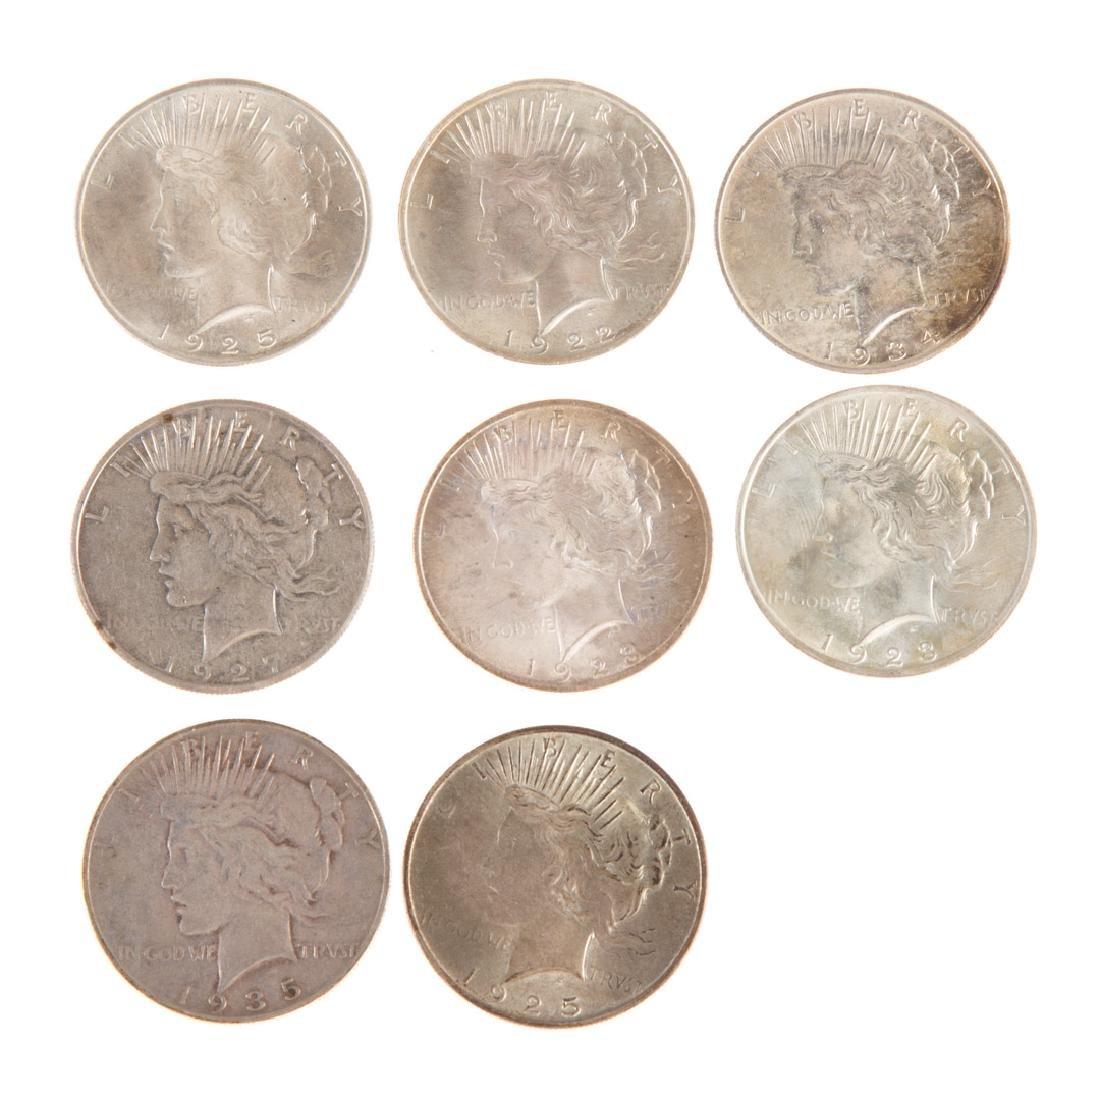 [US] 8 Better Peace Dollars